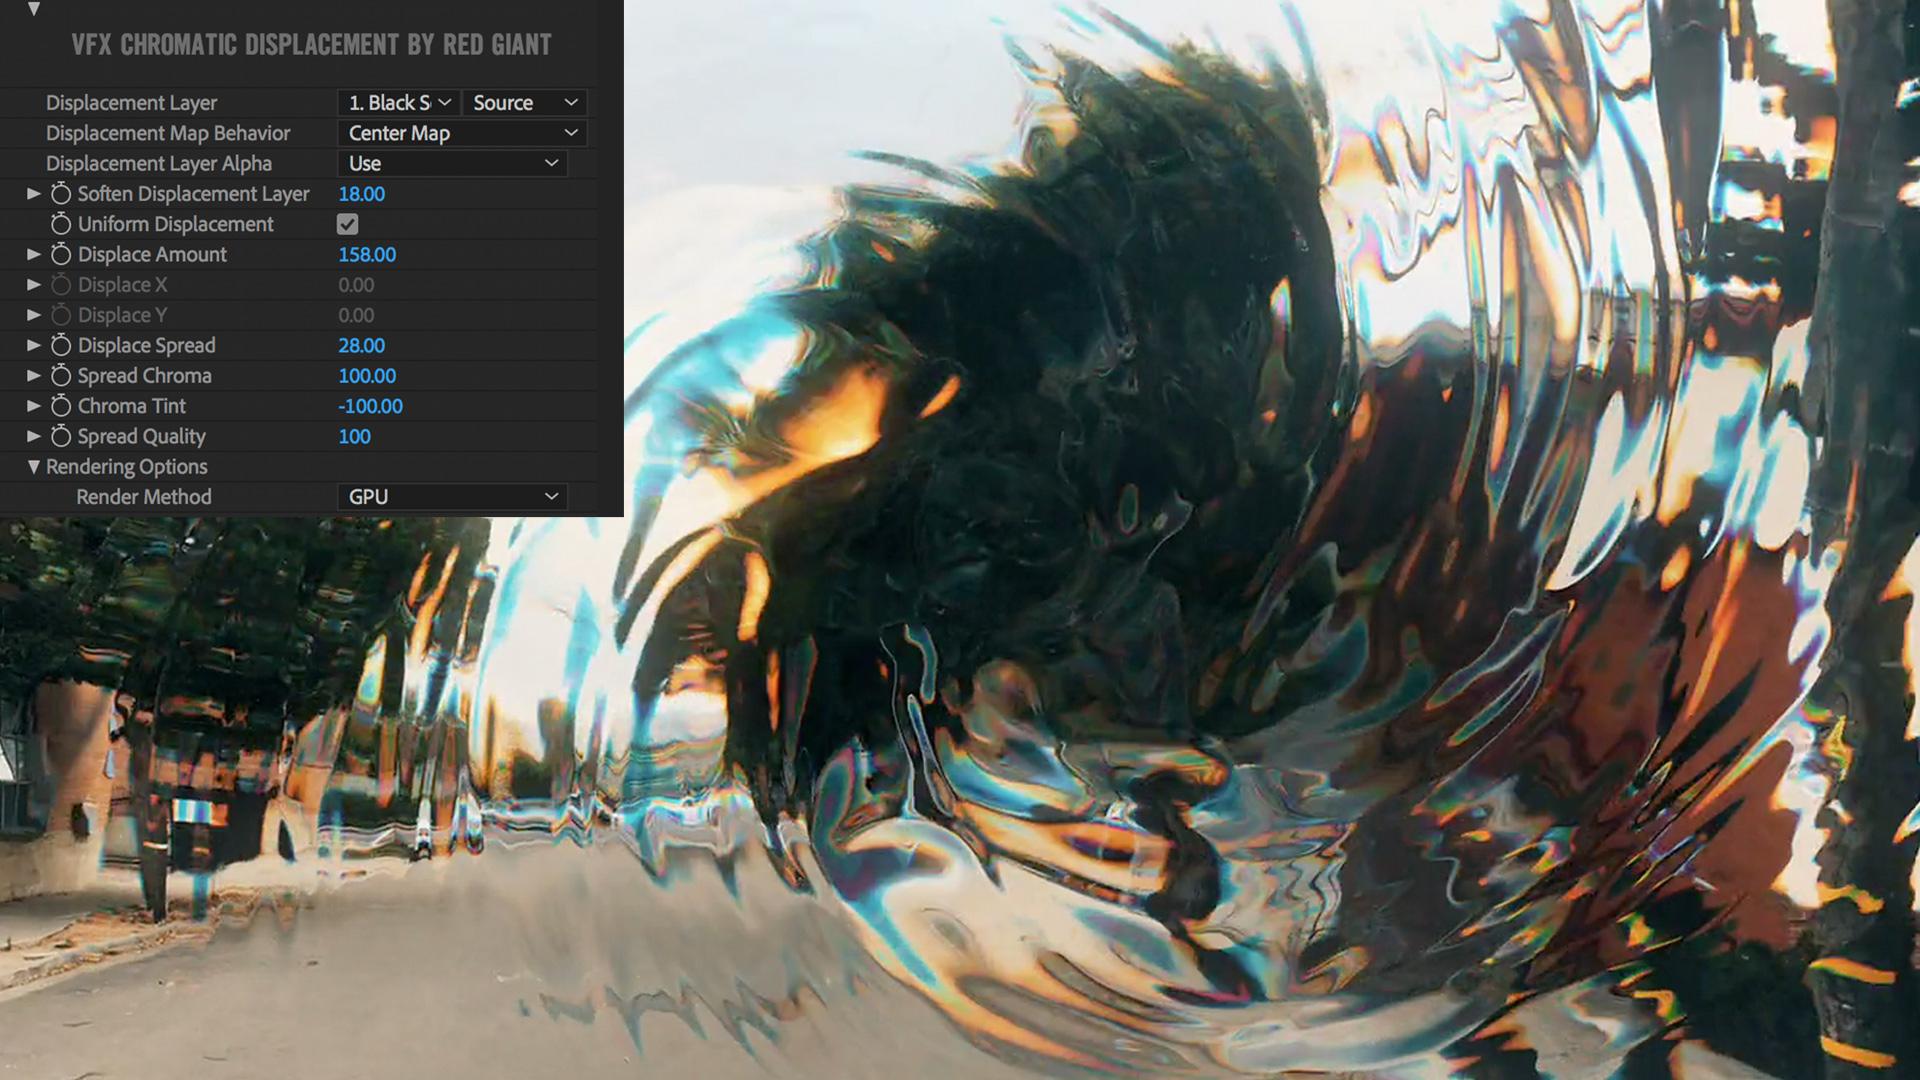 Red Giant VFX Suite v1.0.5 x64 - ENG